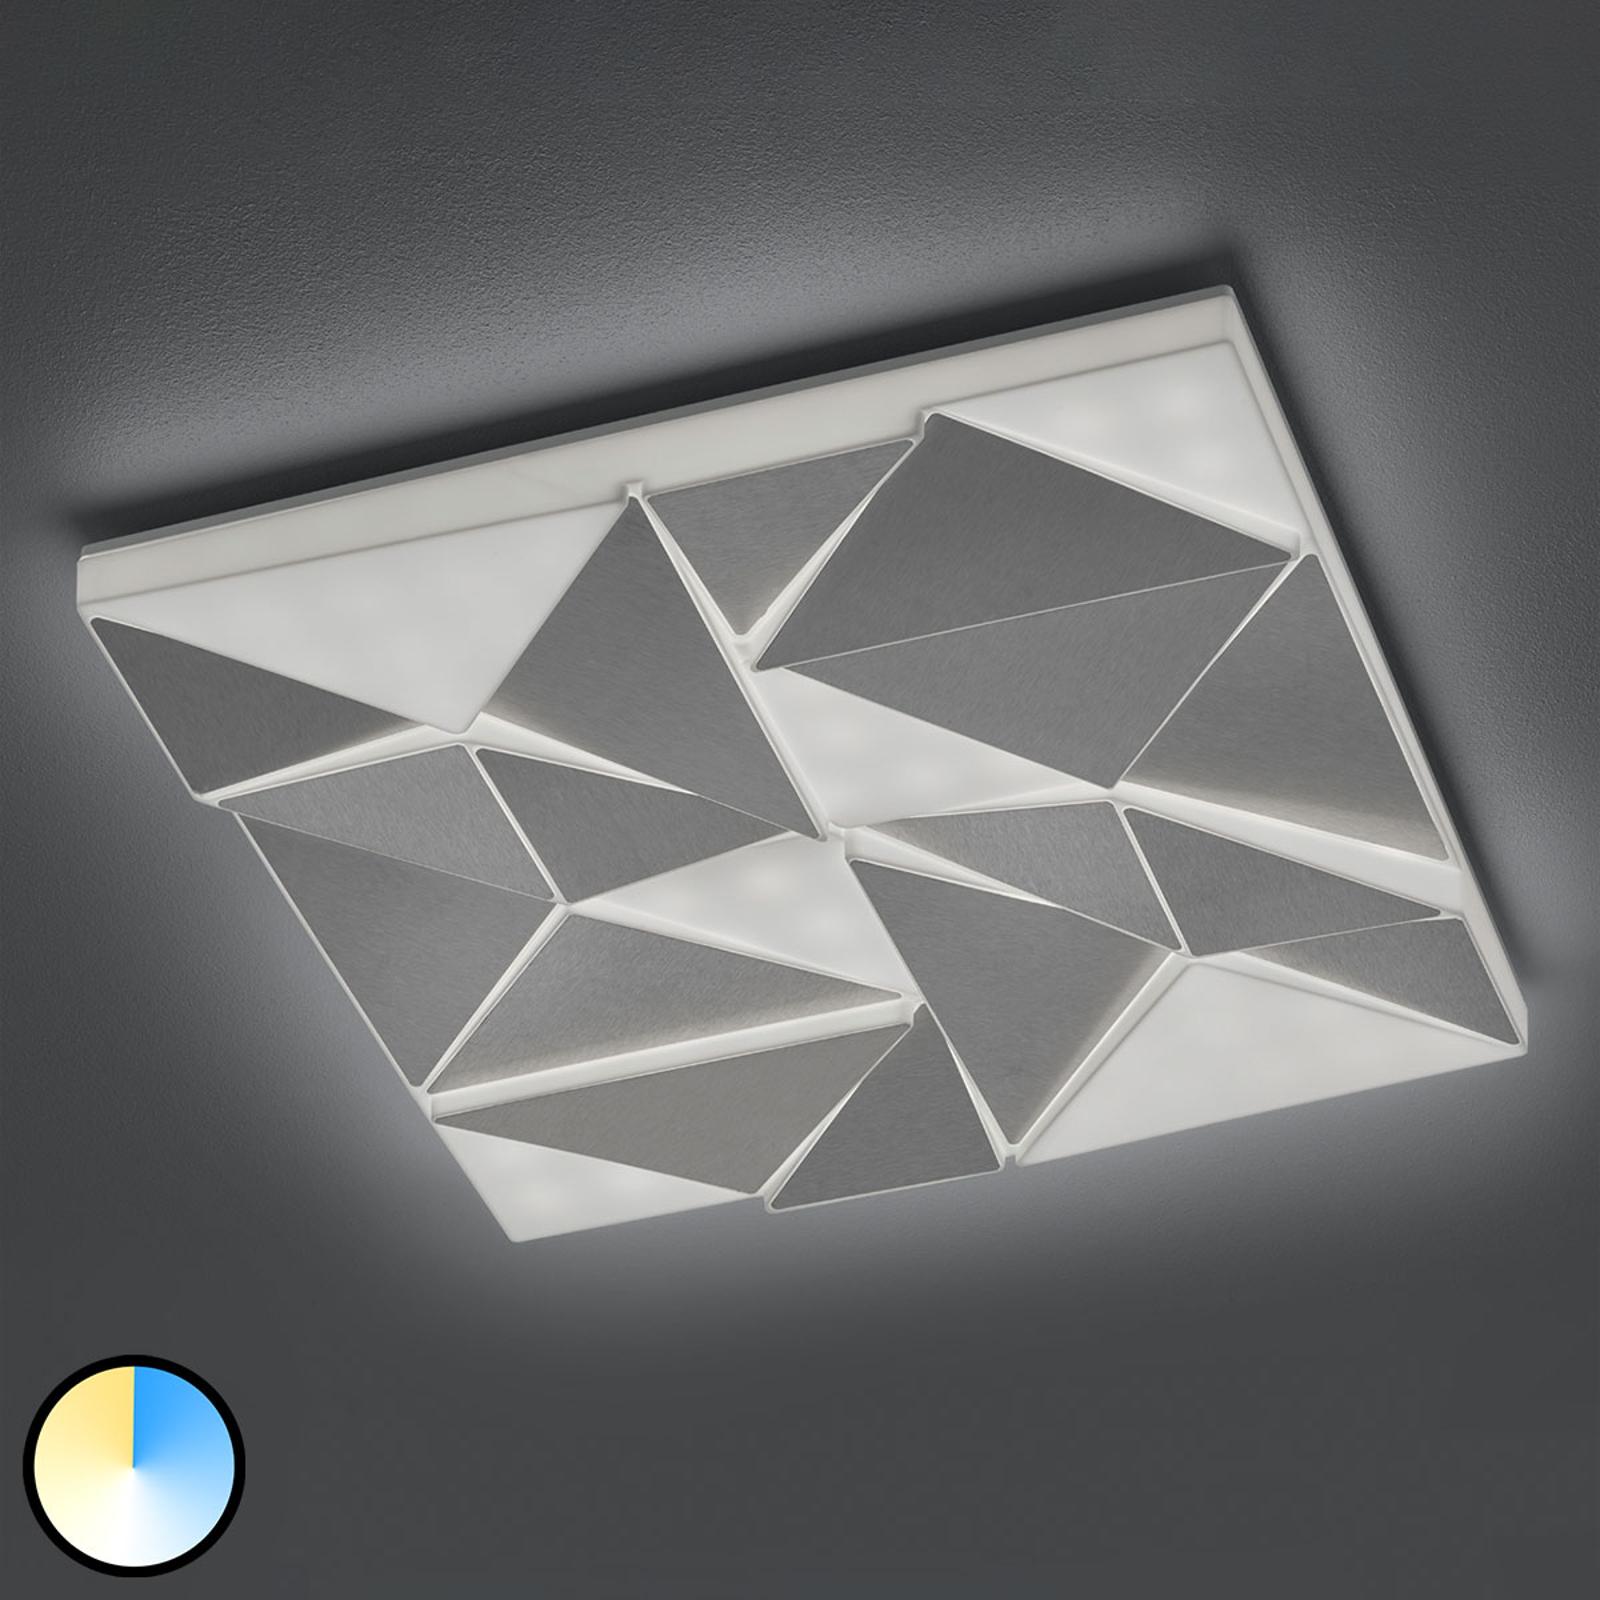 LED-kattovalaisin Trinity yövalolla, 60x60 cm